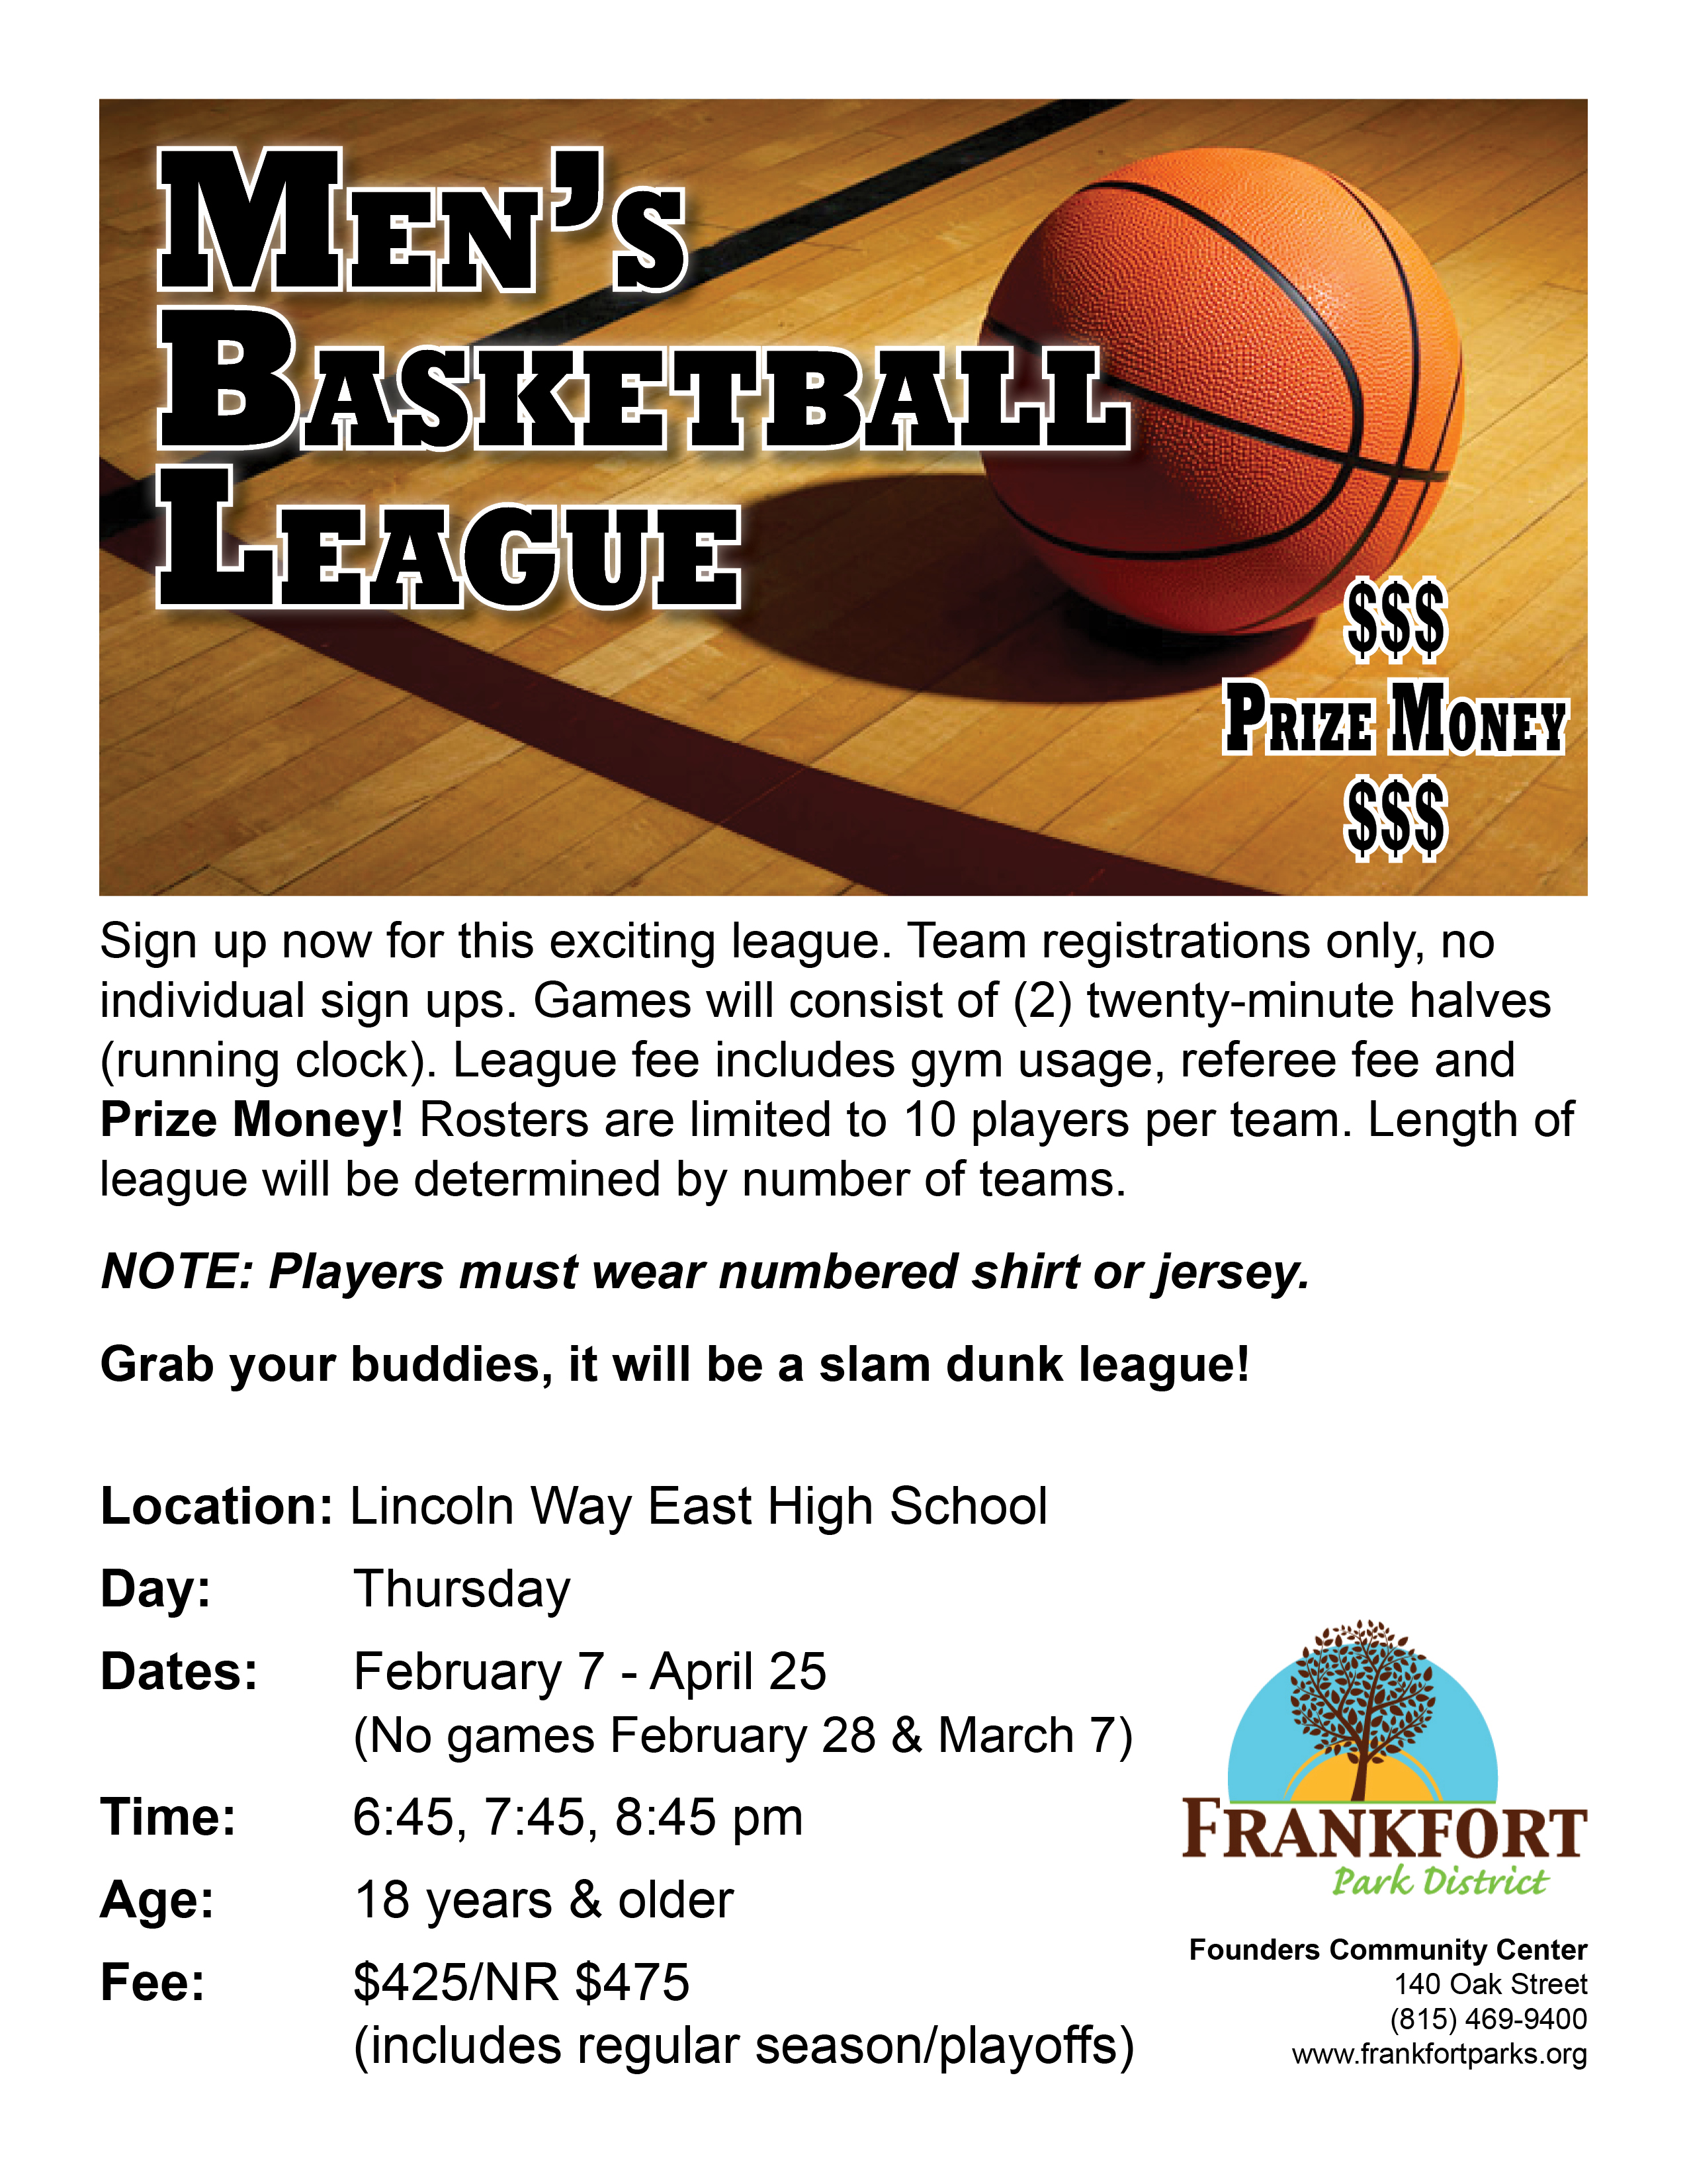 Mens Basketball League Winter 2019 - Frankfort Park District